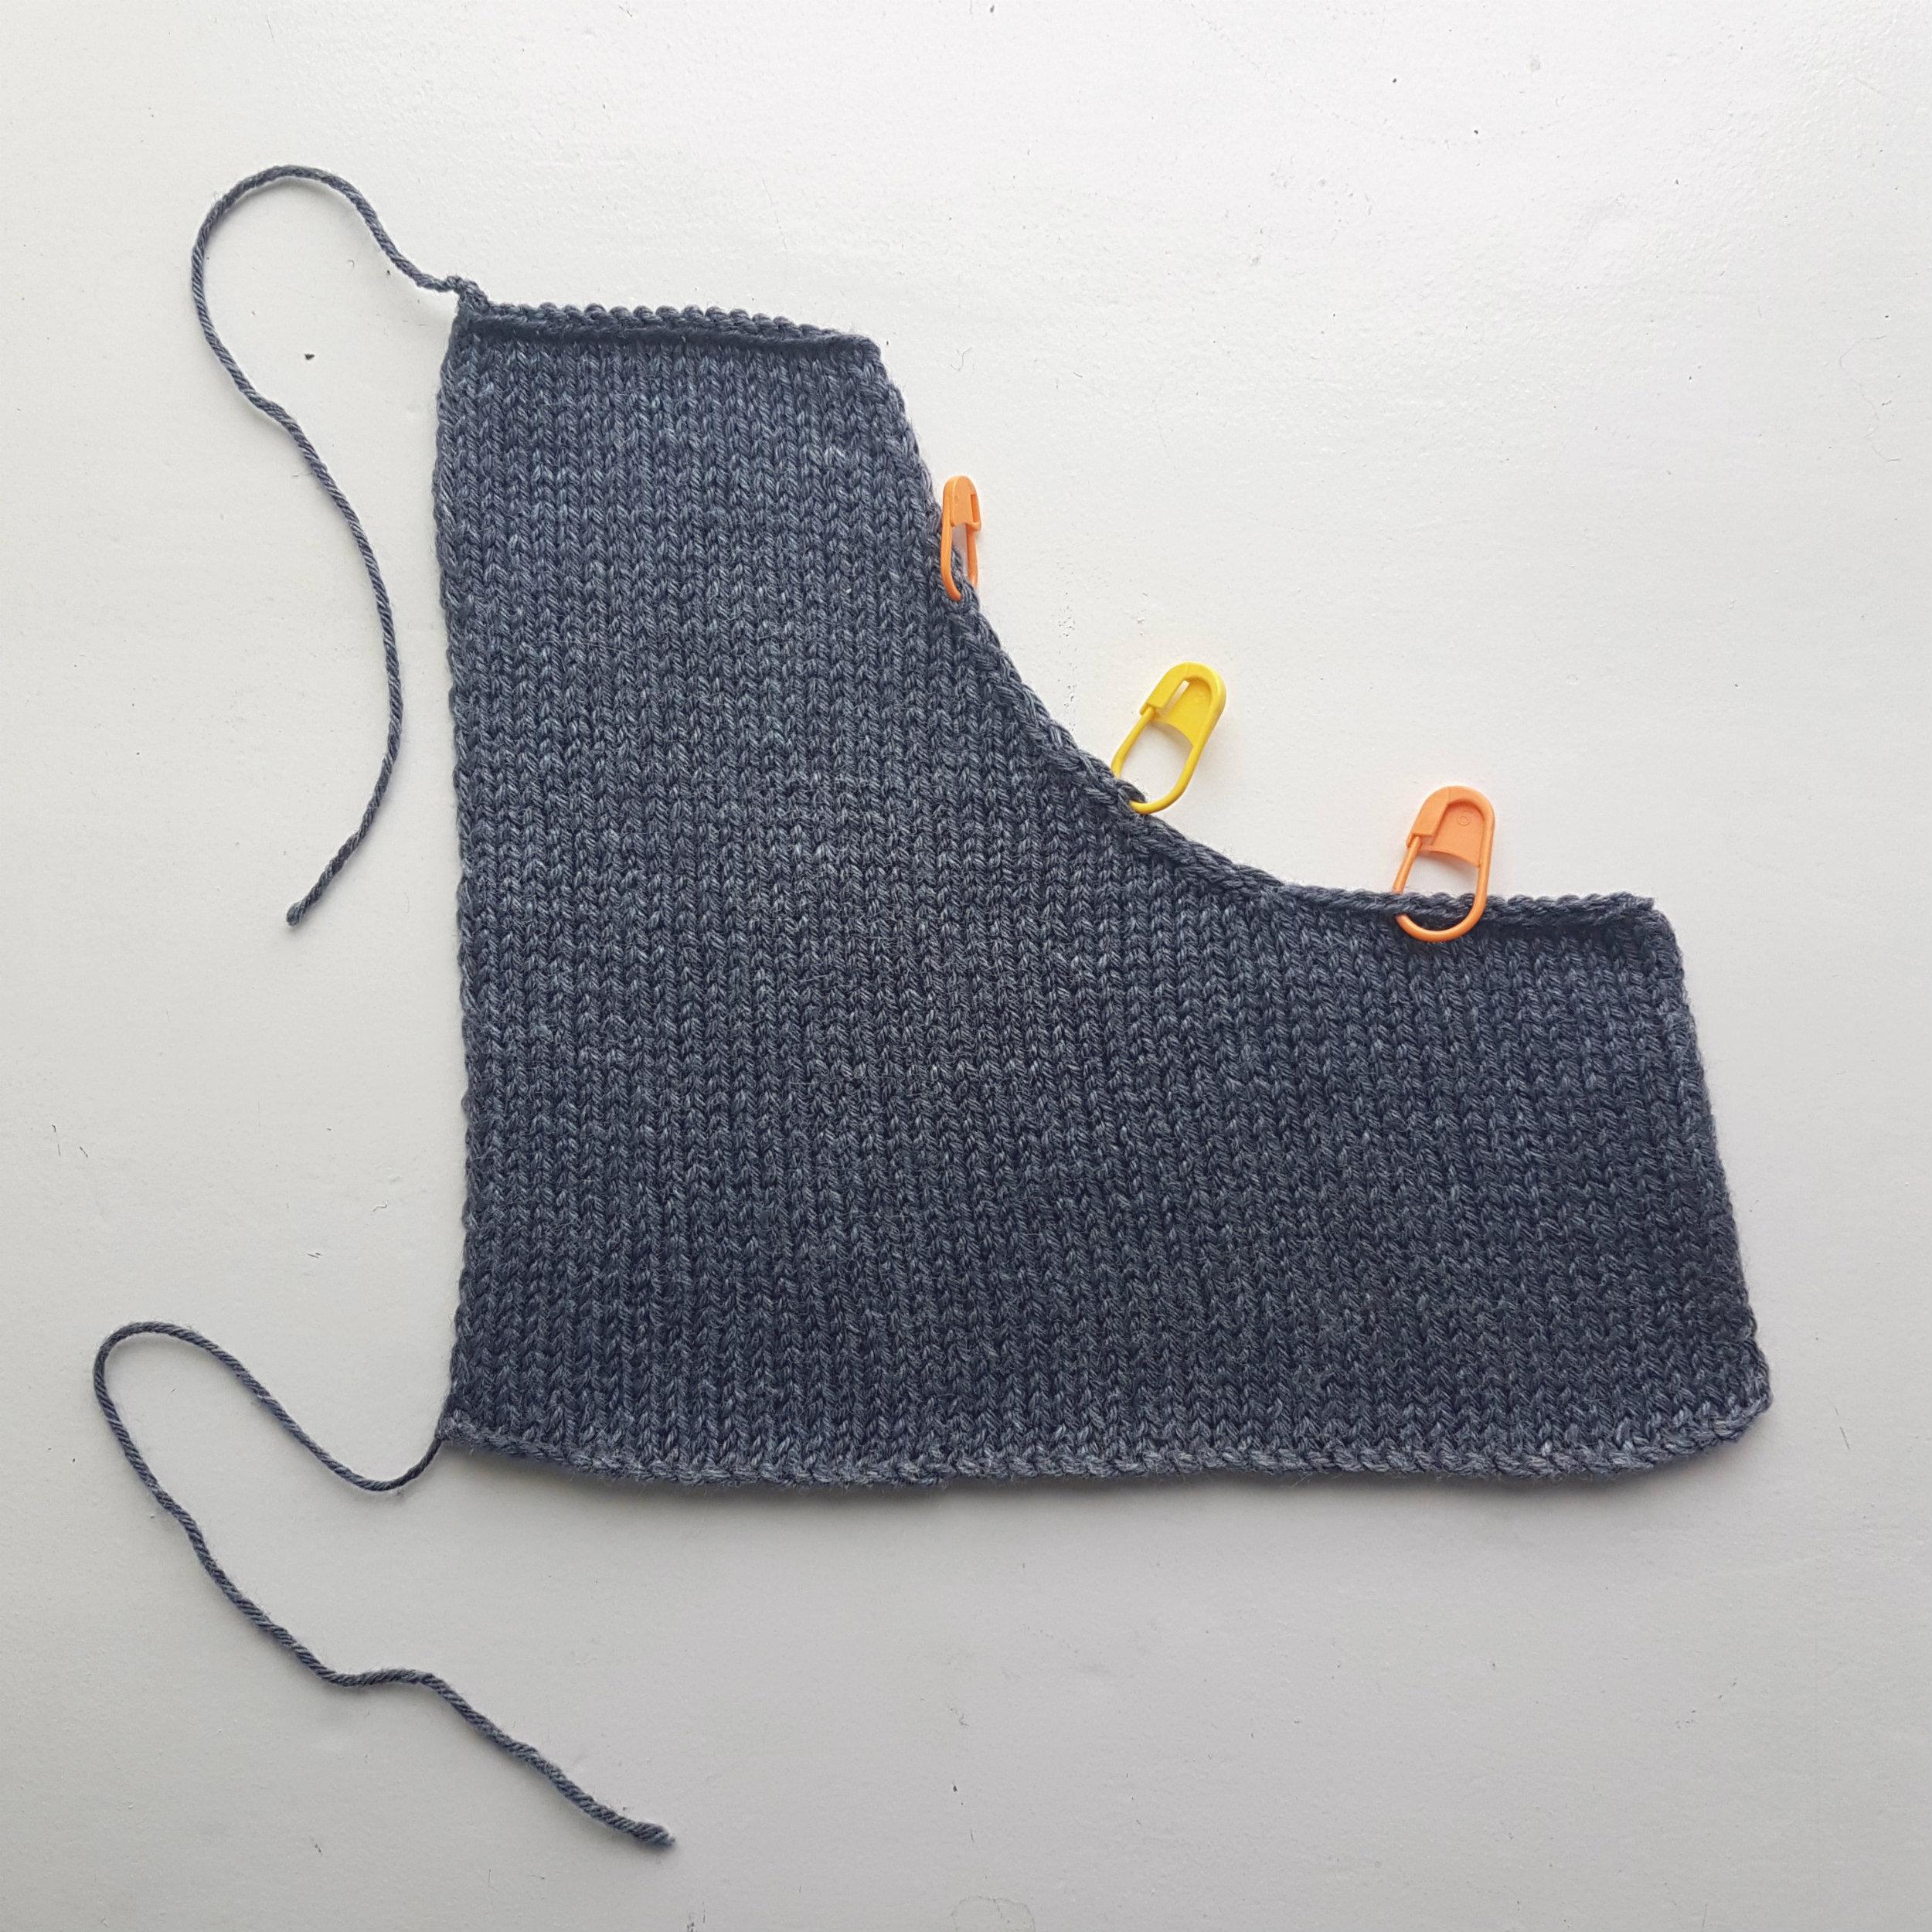 Neckline Swatch with Stitch Markers